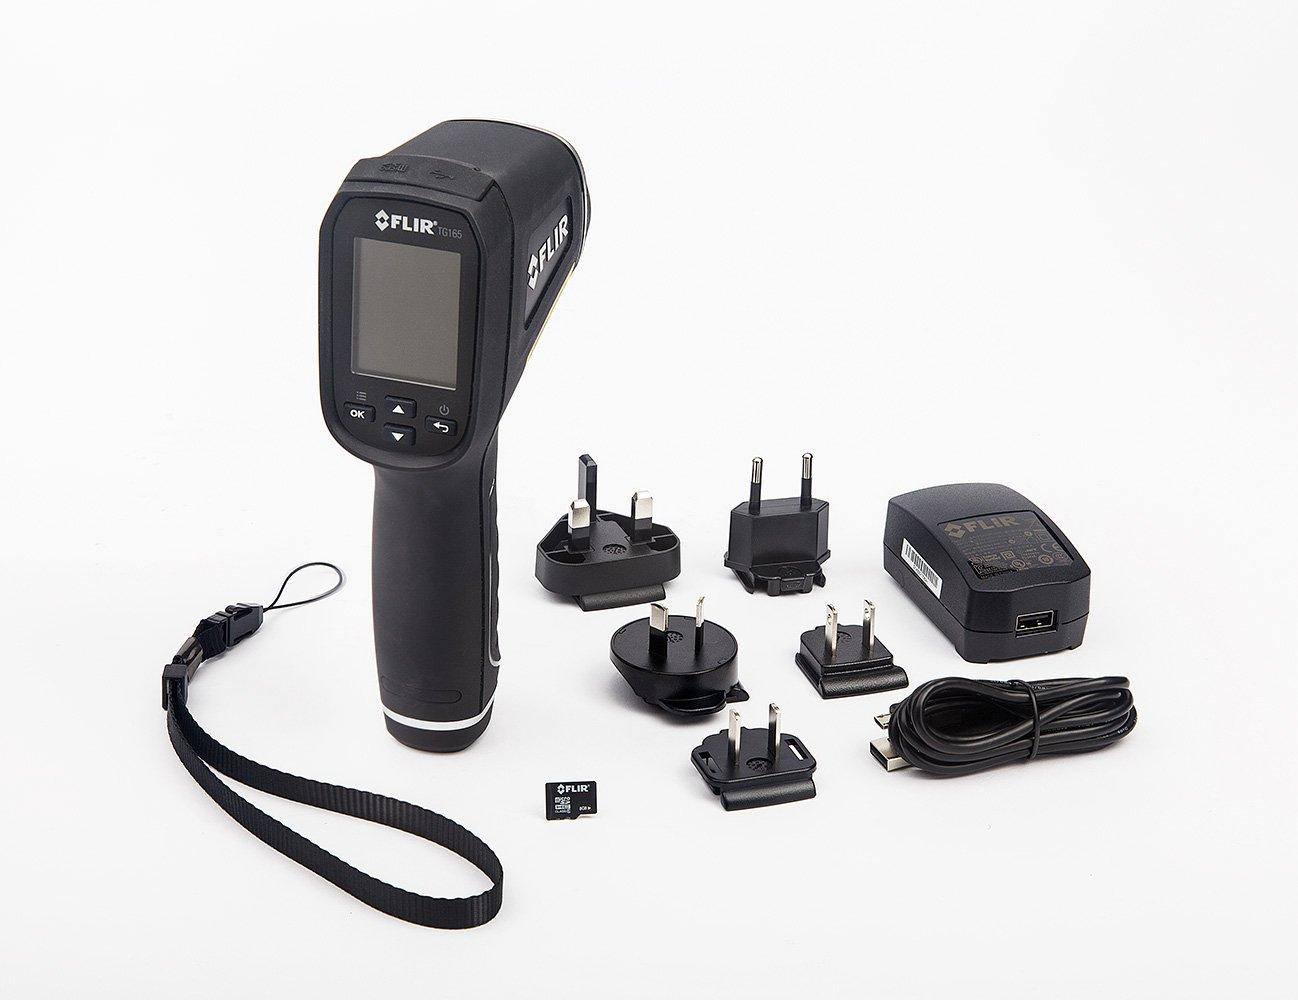 FLIR Spot Thermal Camera